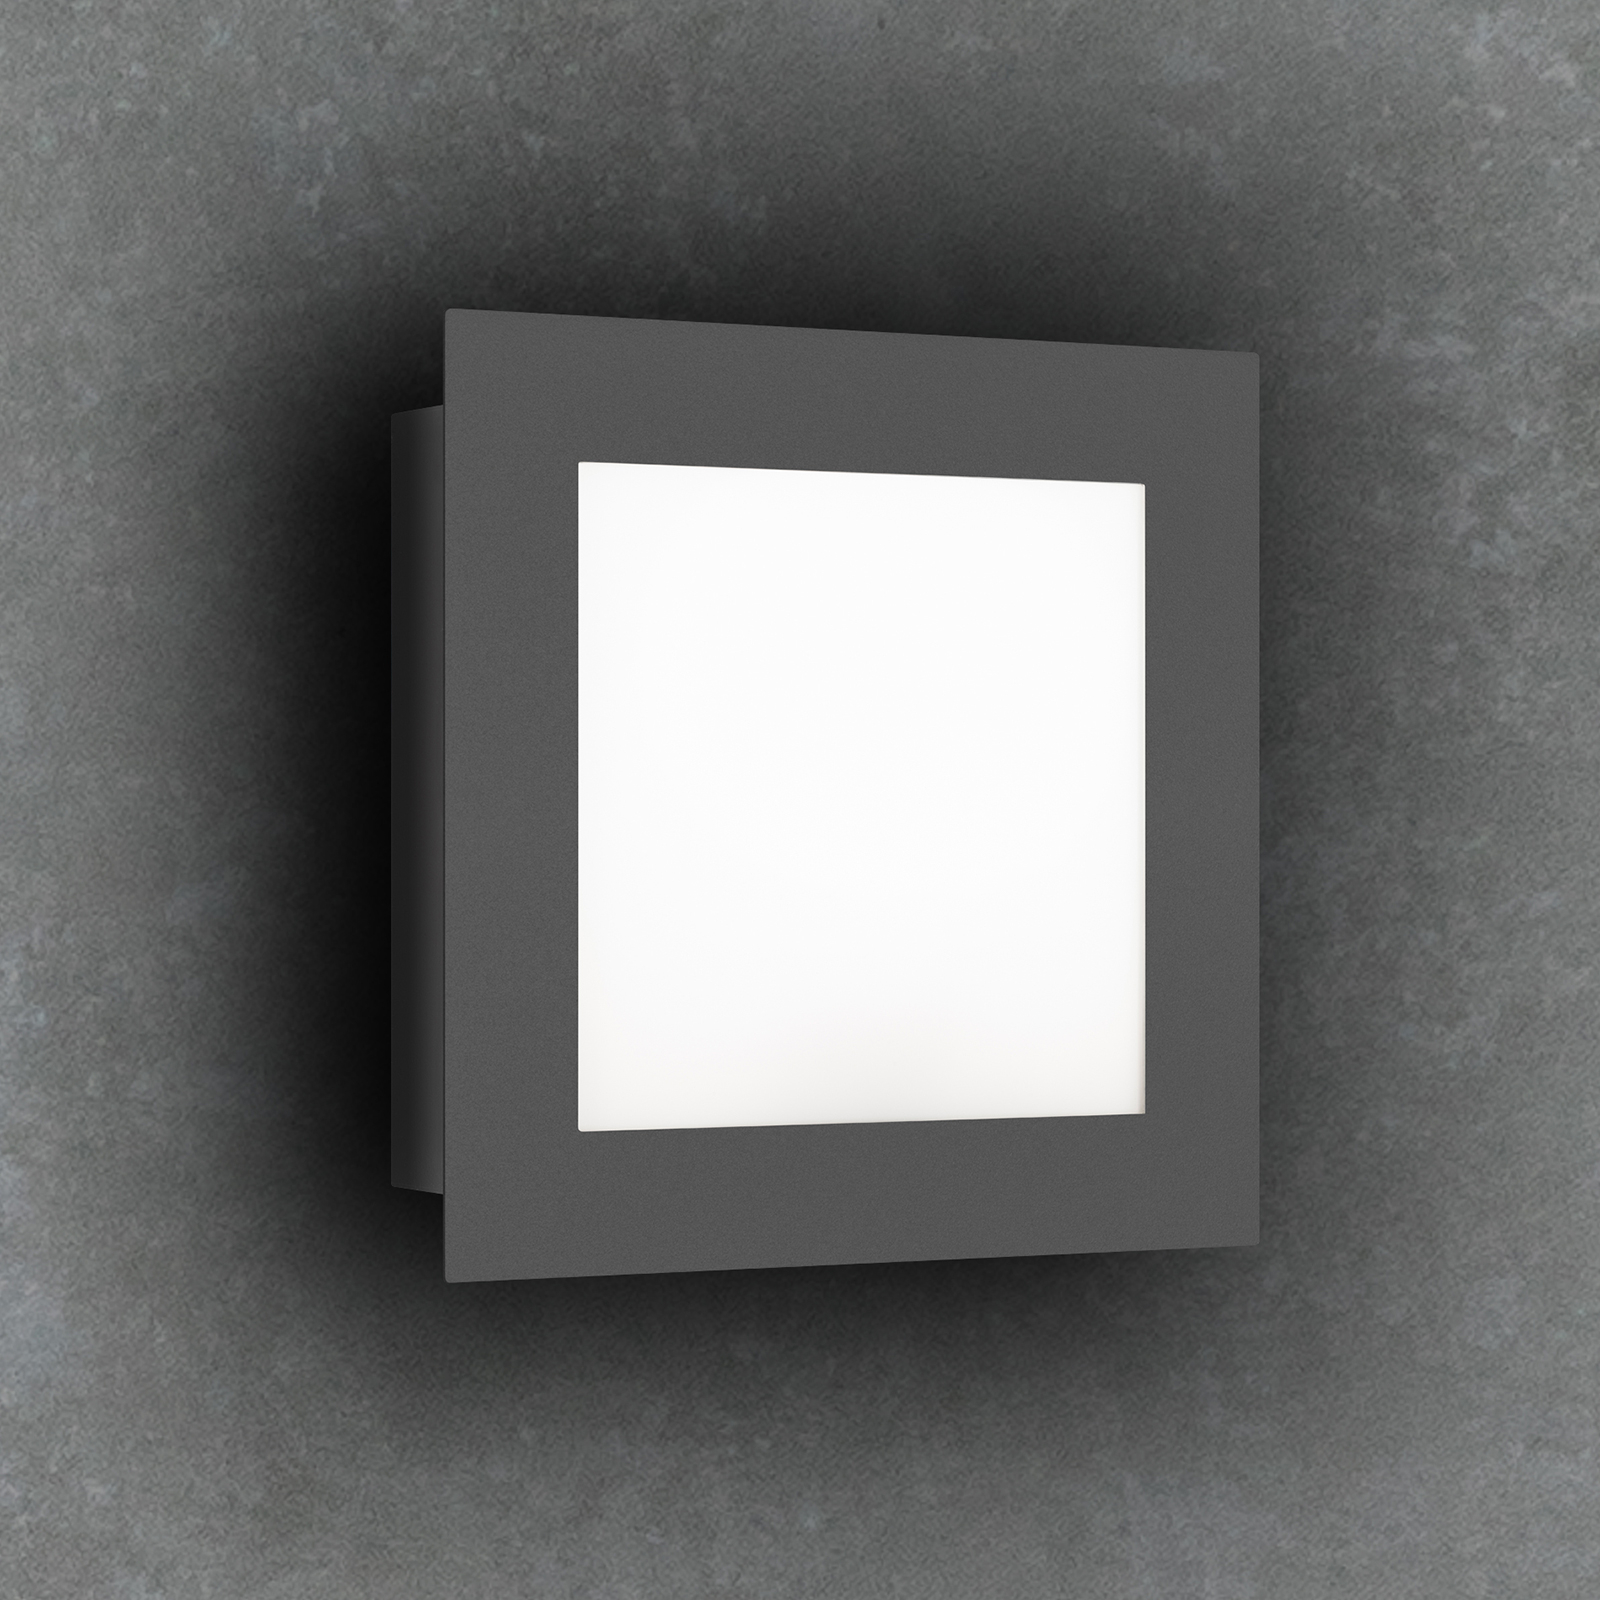 LED-Außenwandleuchte 3007LED, grafit